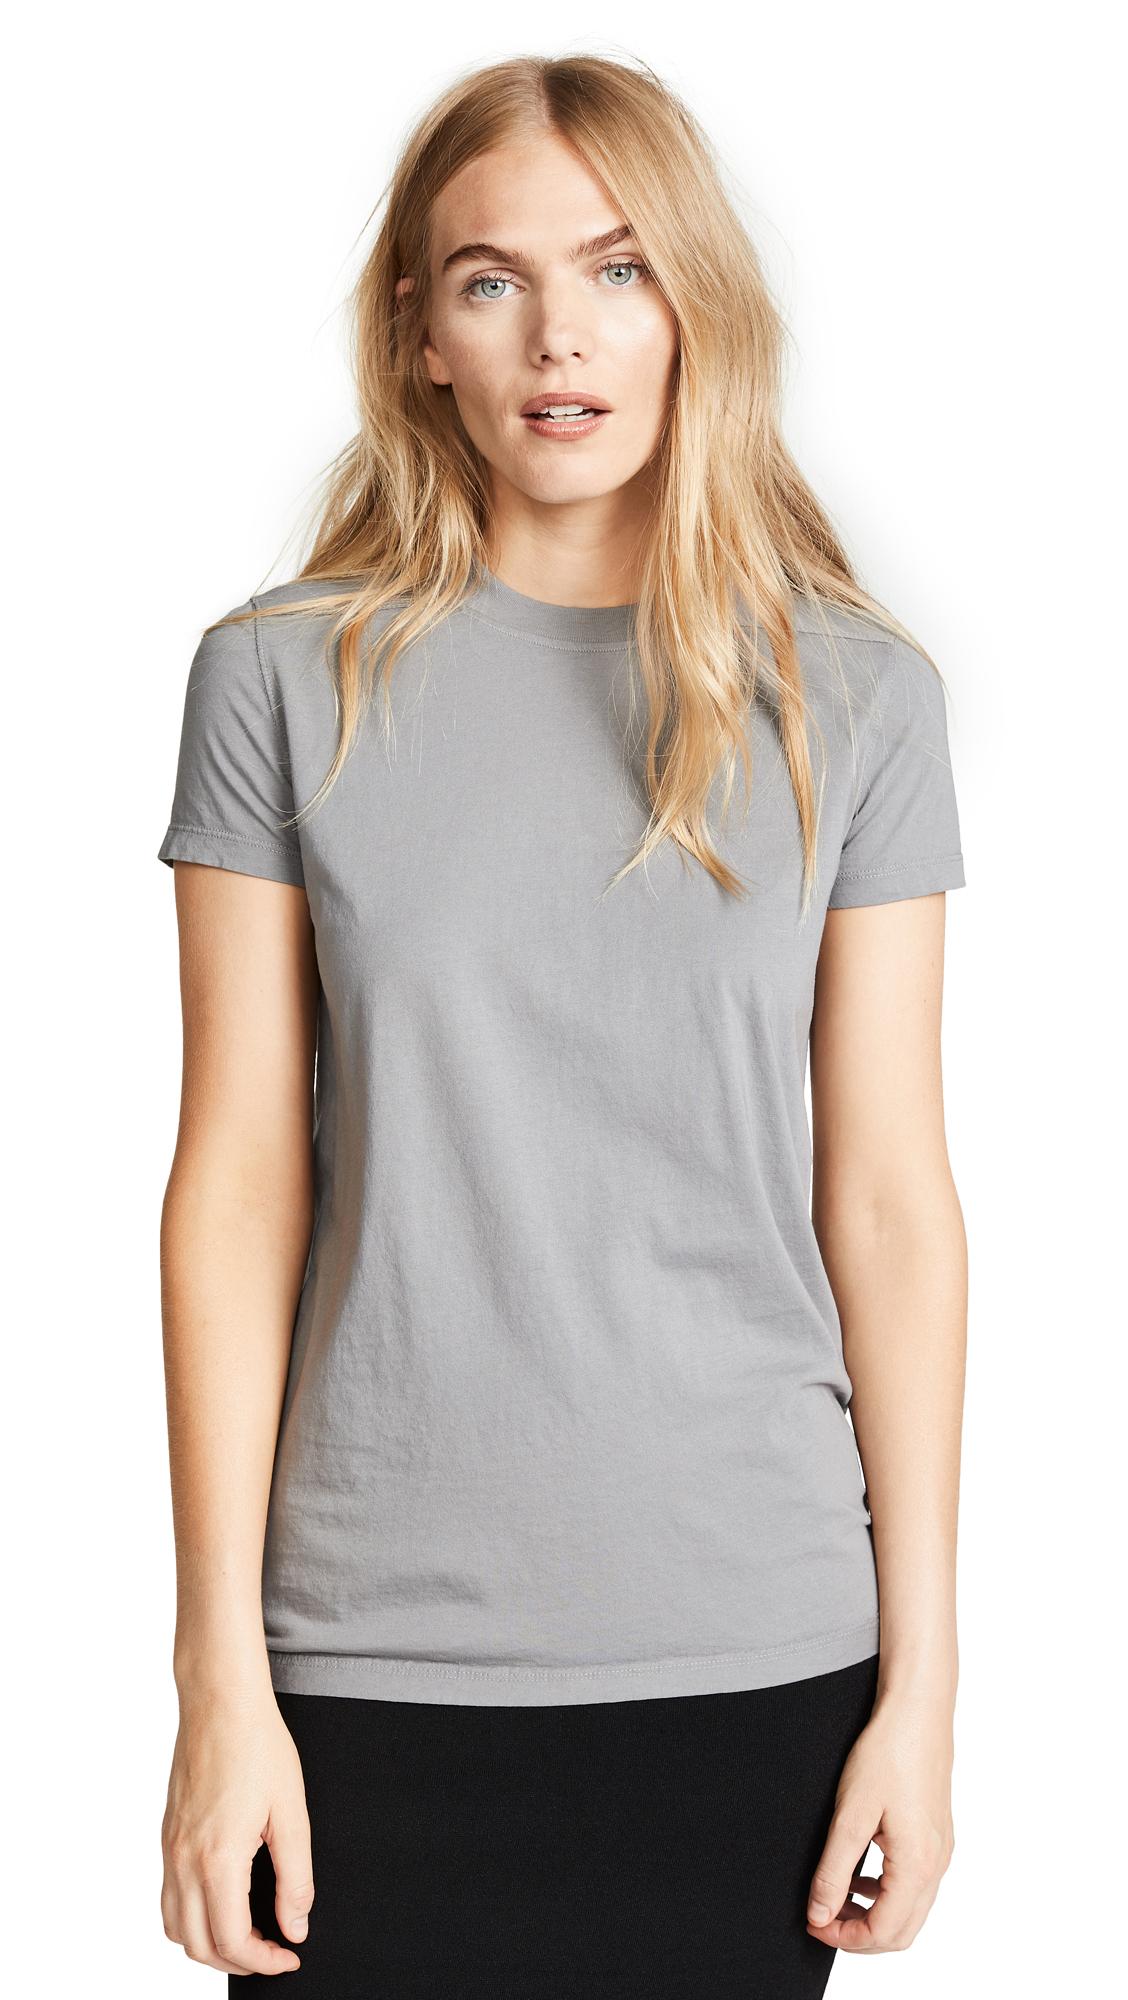 Rick Owens DRKSHDW T-Shirt In Blue